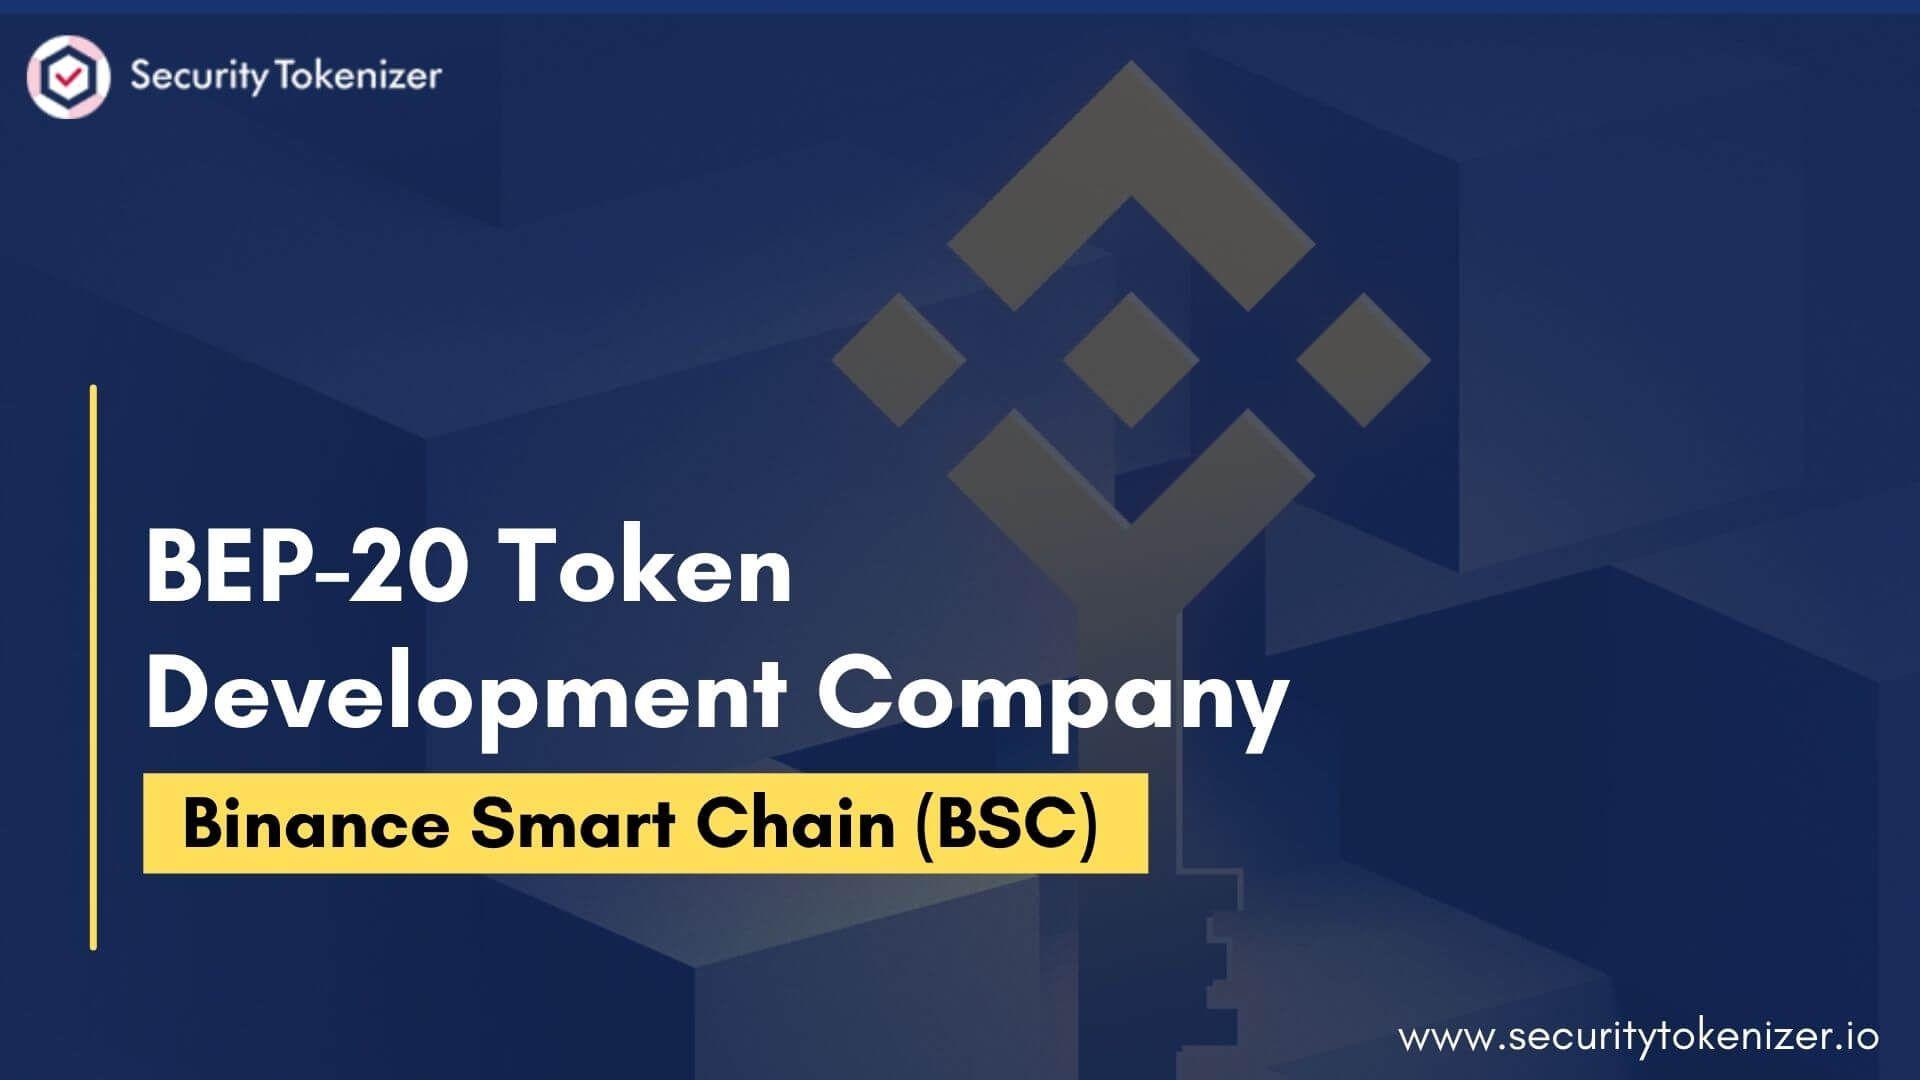 BEP-20 Token Development Company | Create BEP-20 Token on Binance Smart Chain